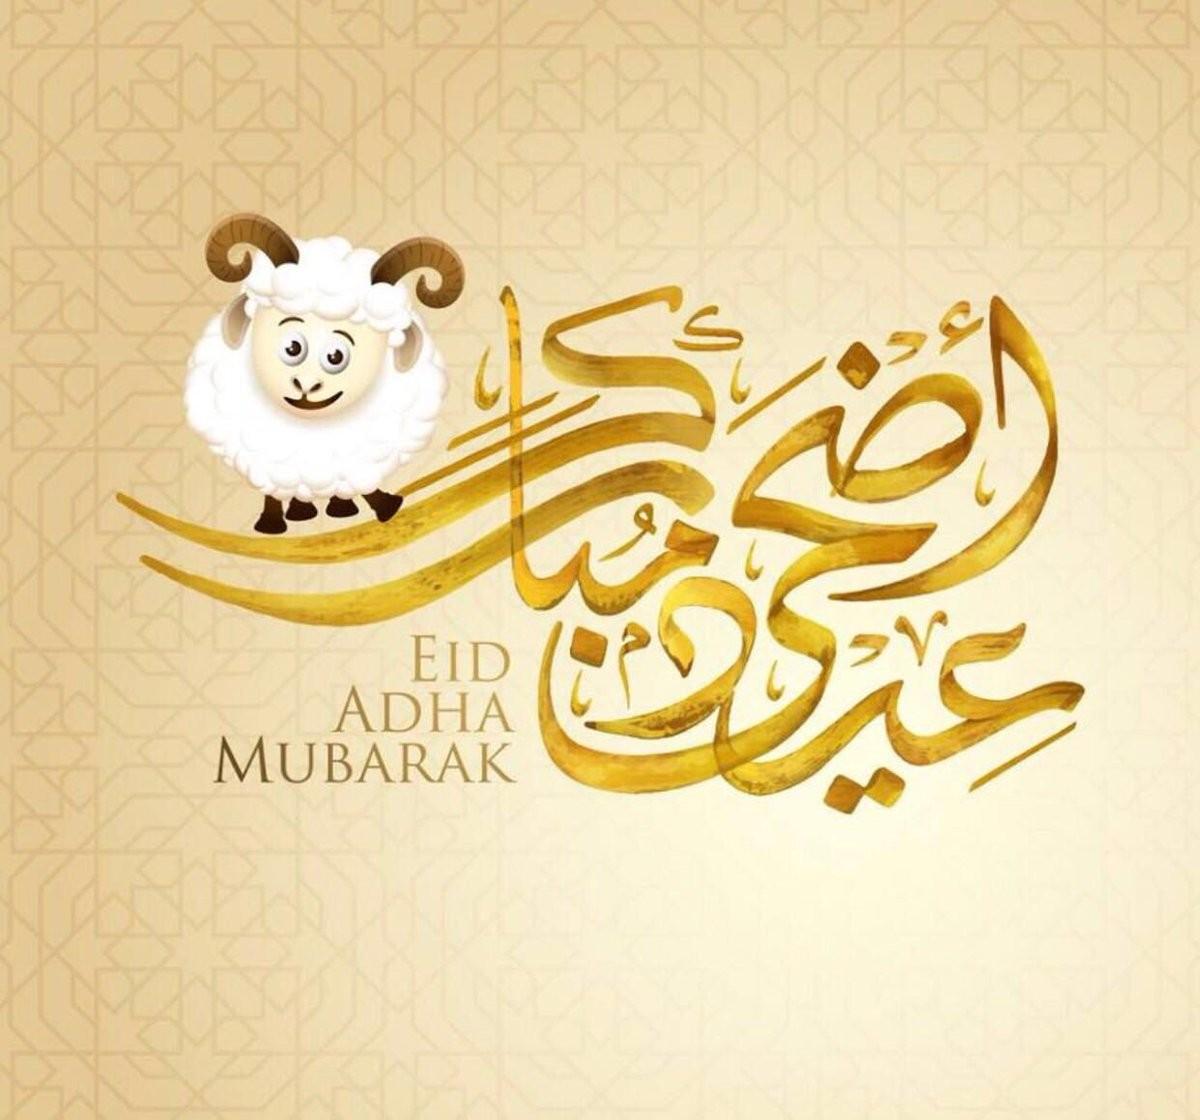 صور تهنئه بعيد الاضحي , عيد اضحي مبارك اجمل حلوات